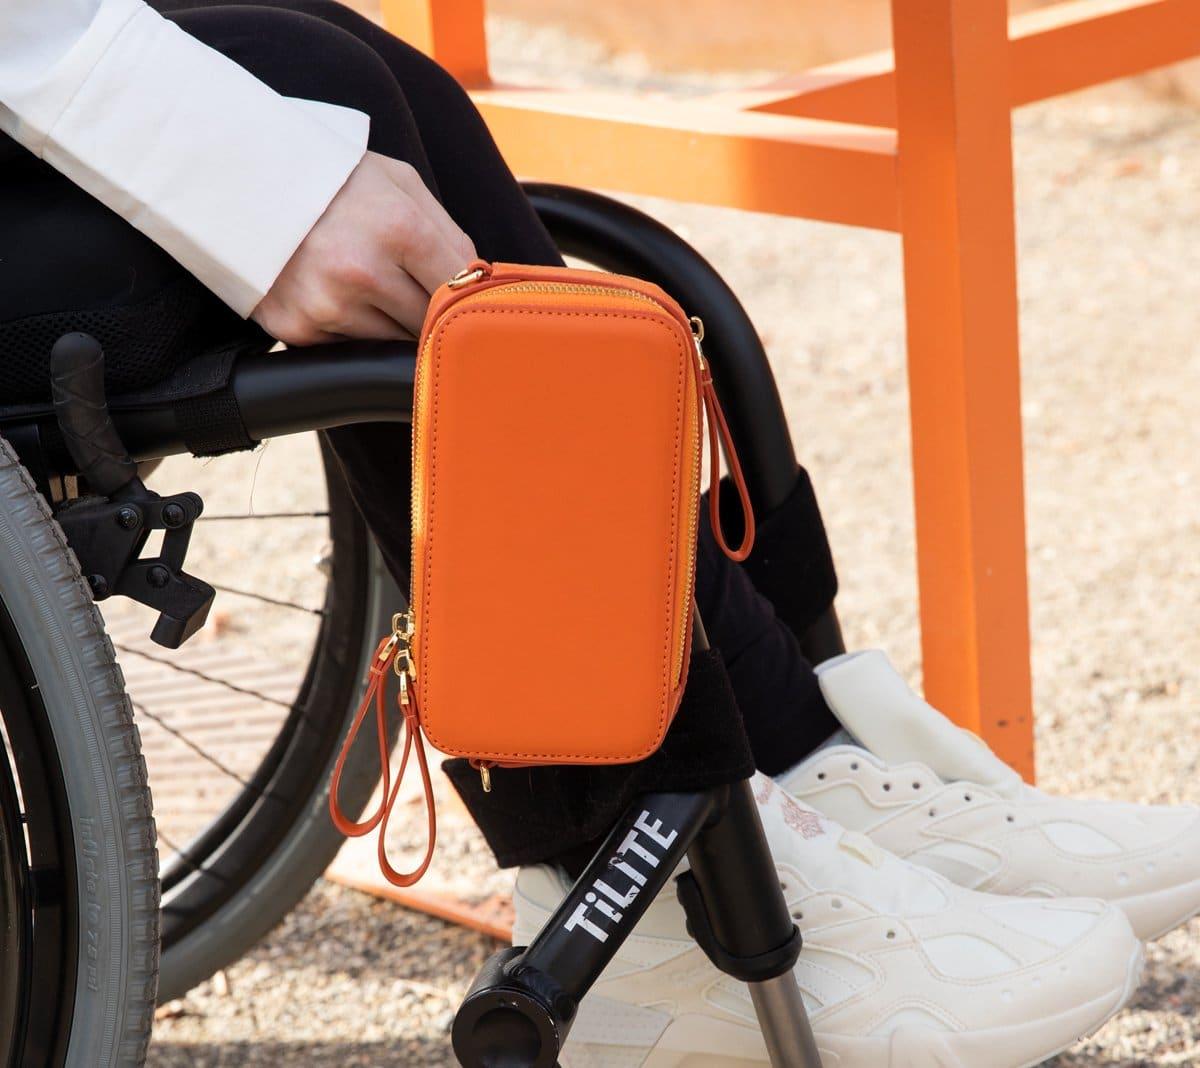 ffora adaptive accessories brand new york